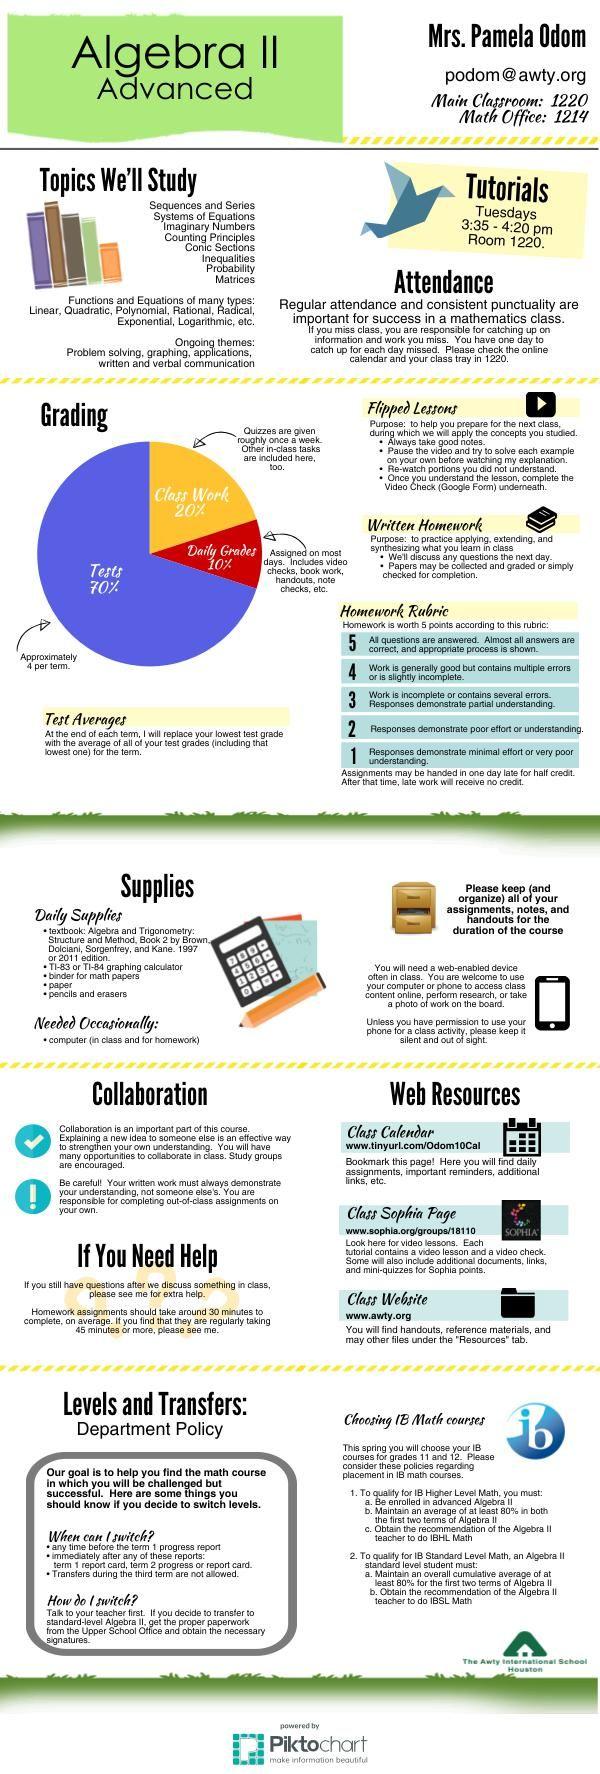 Alg II Syllabus | Piktochart Infographic Editor | Education | Maths